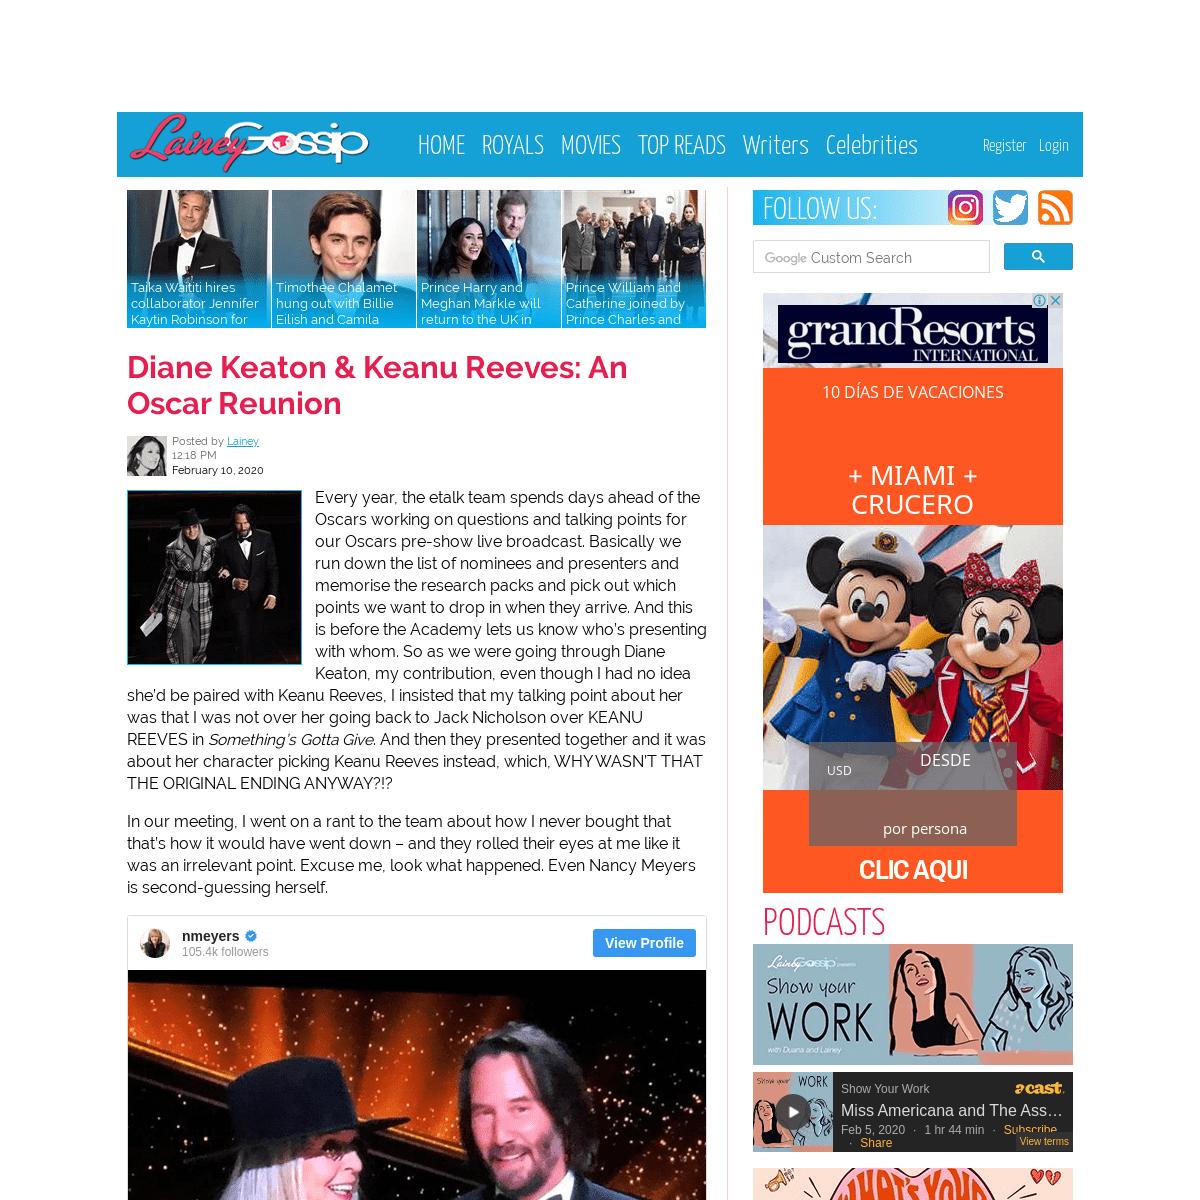 Diane Keaton & Keanu Reeves were reunited at the 2020 Oscars